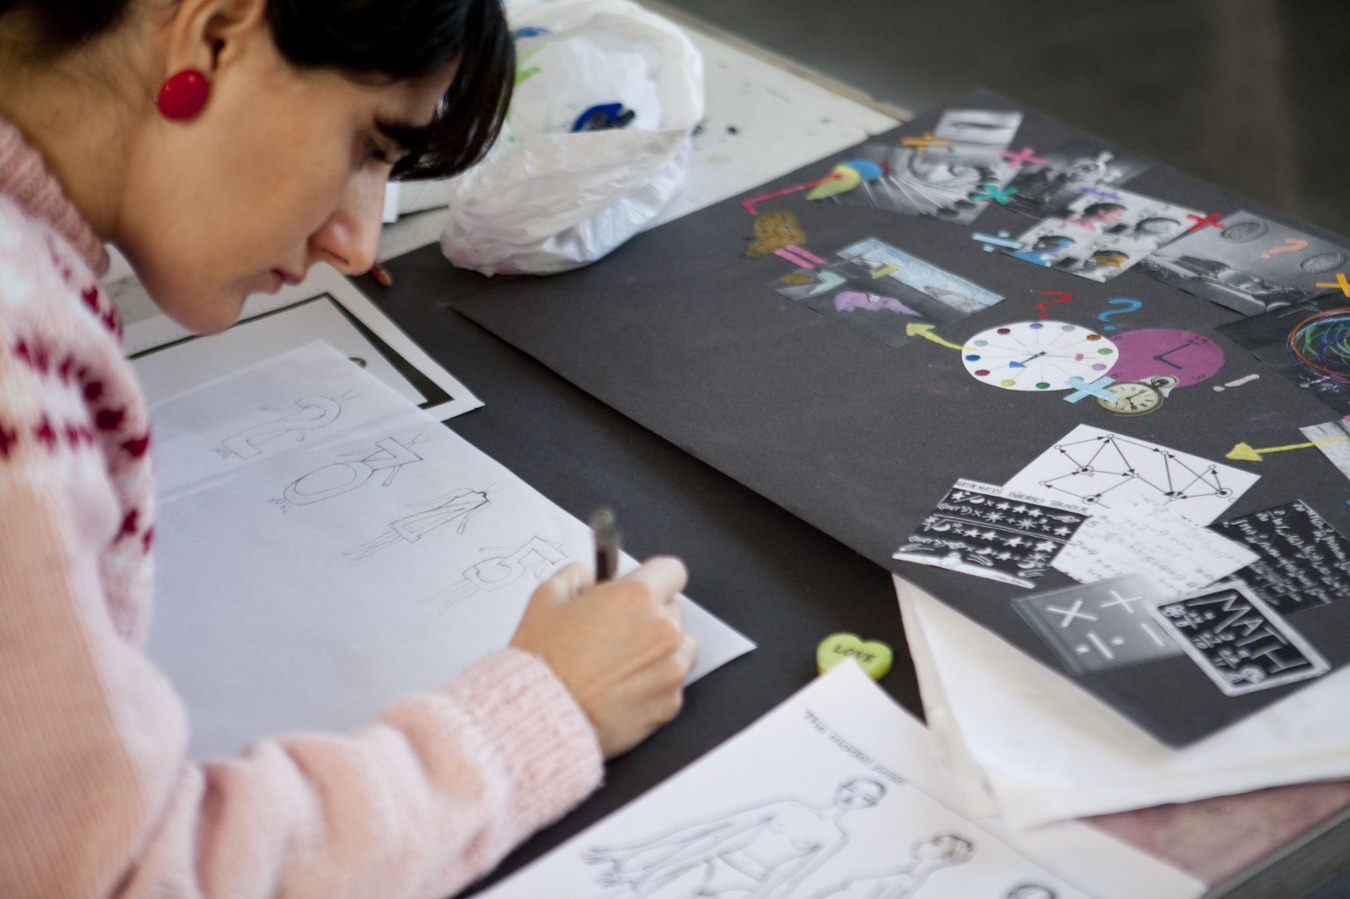 Fashion Design and Making